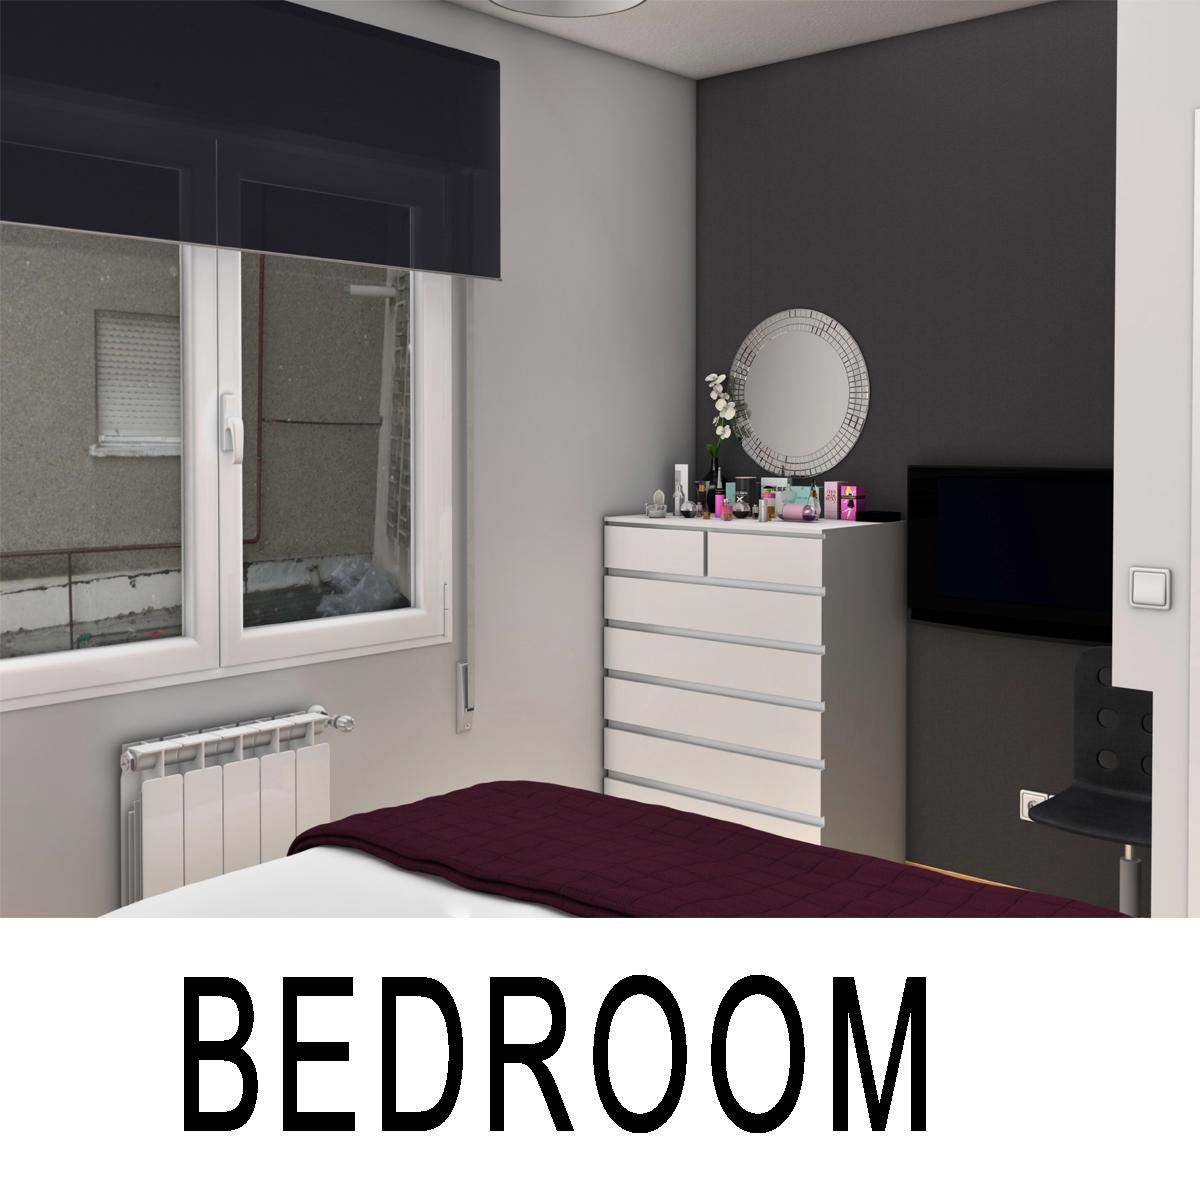 guļamistaba 8 3d modelis 3ds max fbx c4d ma mb obj 159554